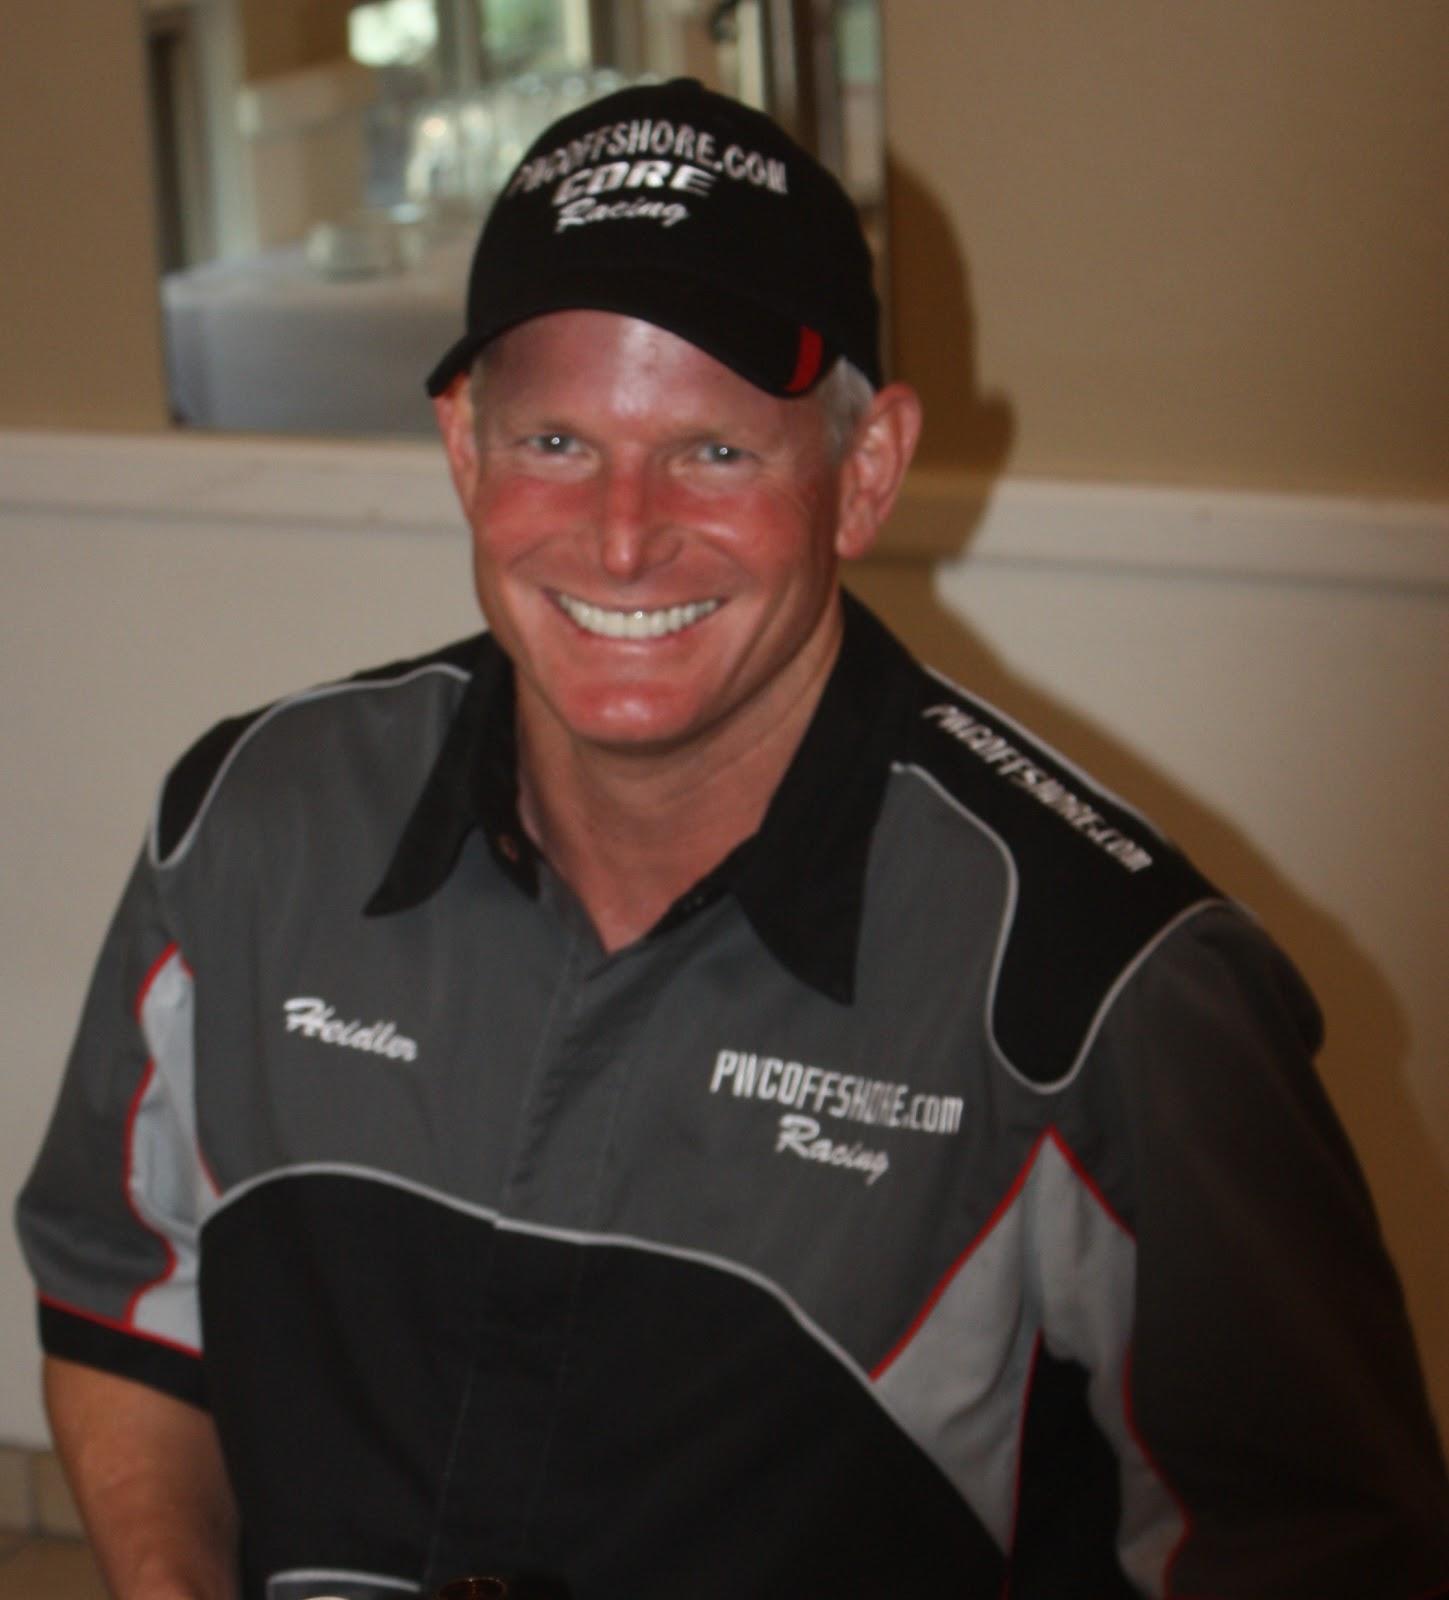 Carmenita Truck Center >> PWCOFFSHORE BLOG - PWC Endurance Racing: Craig Warner Wins ...